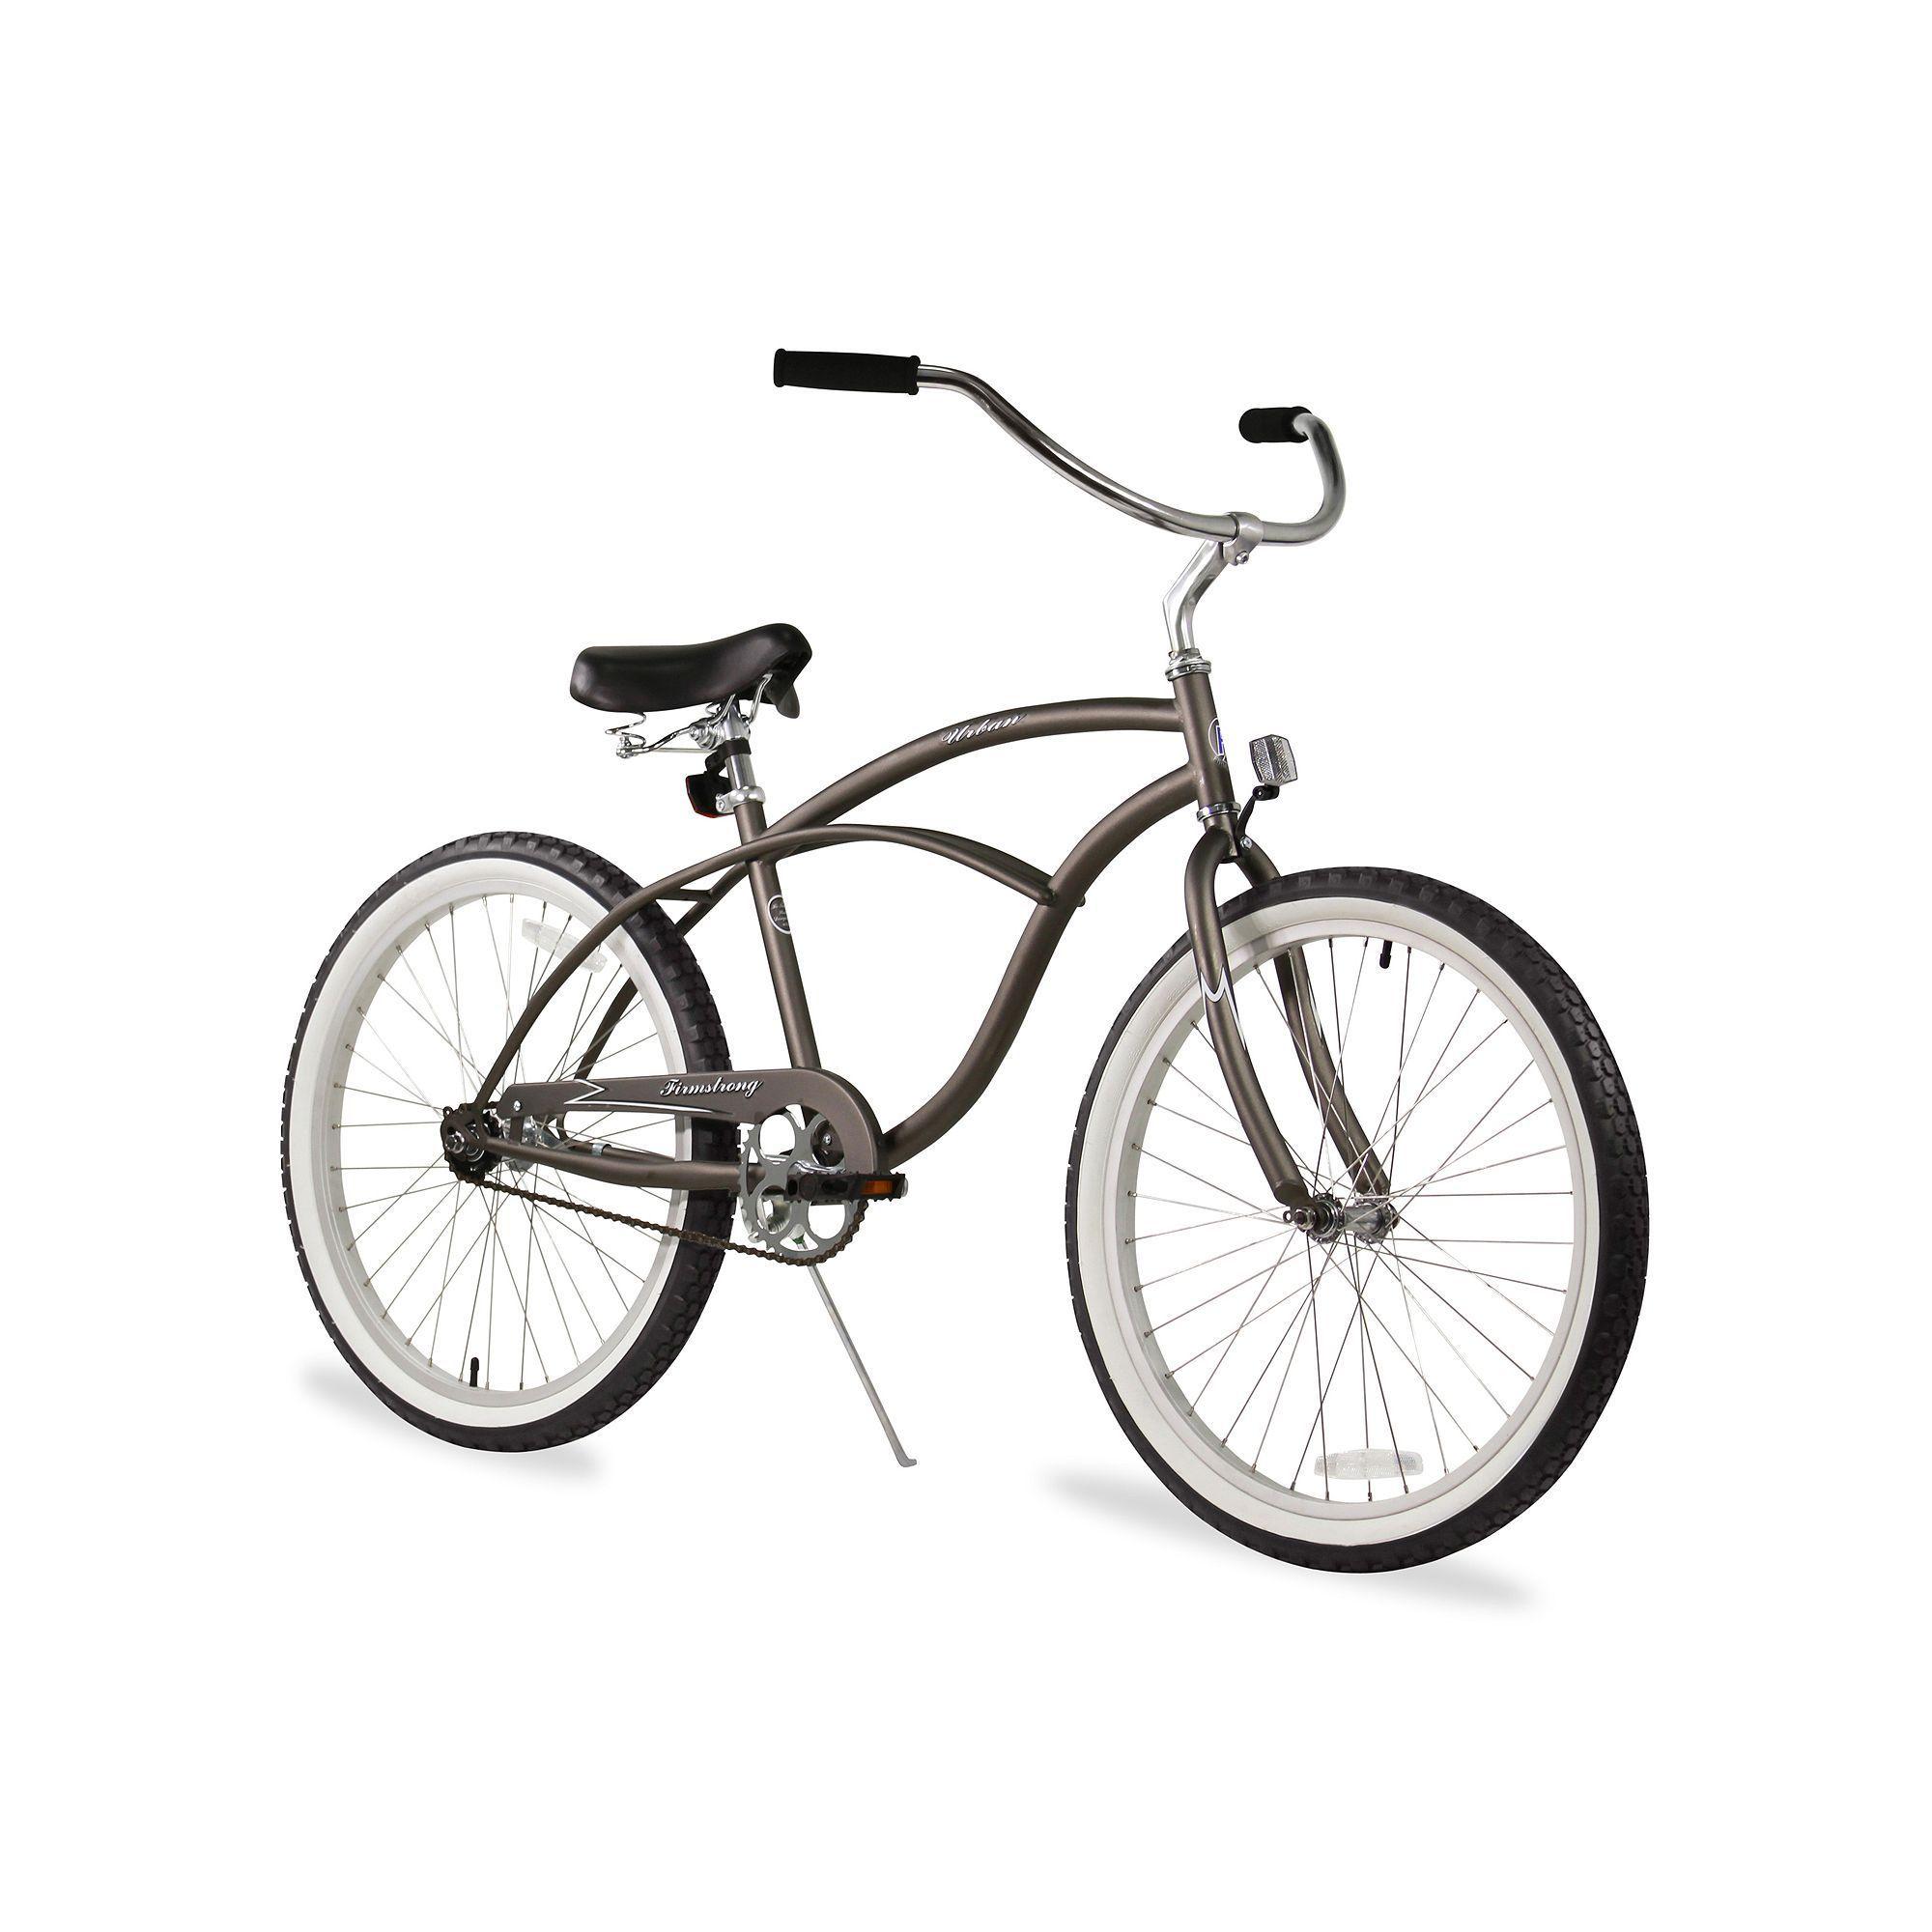 Firmstrong men s 24 in urban single speed beach cruiser bike black